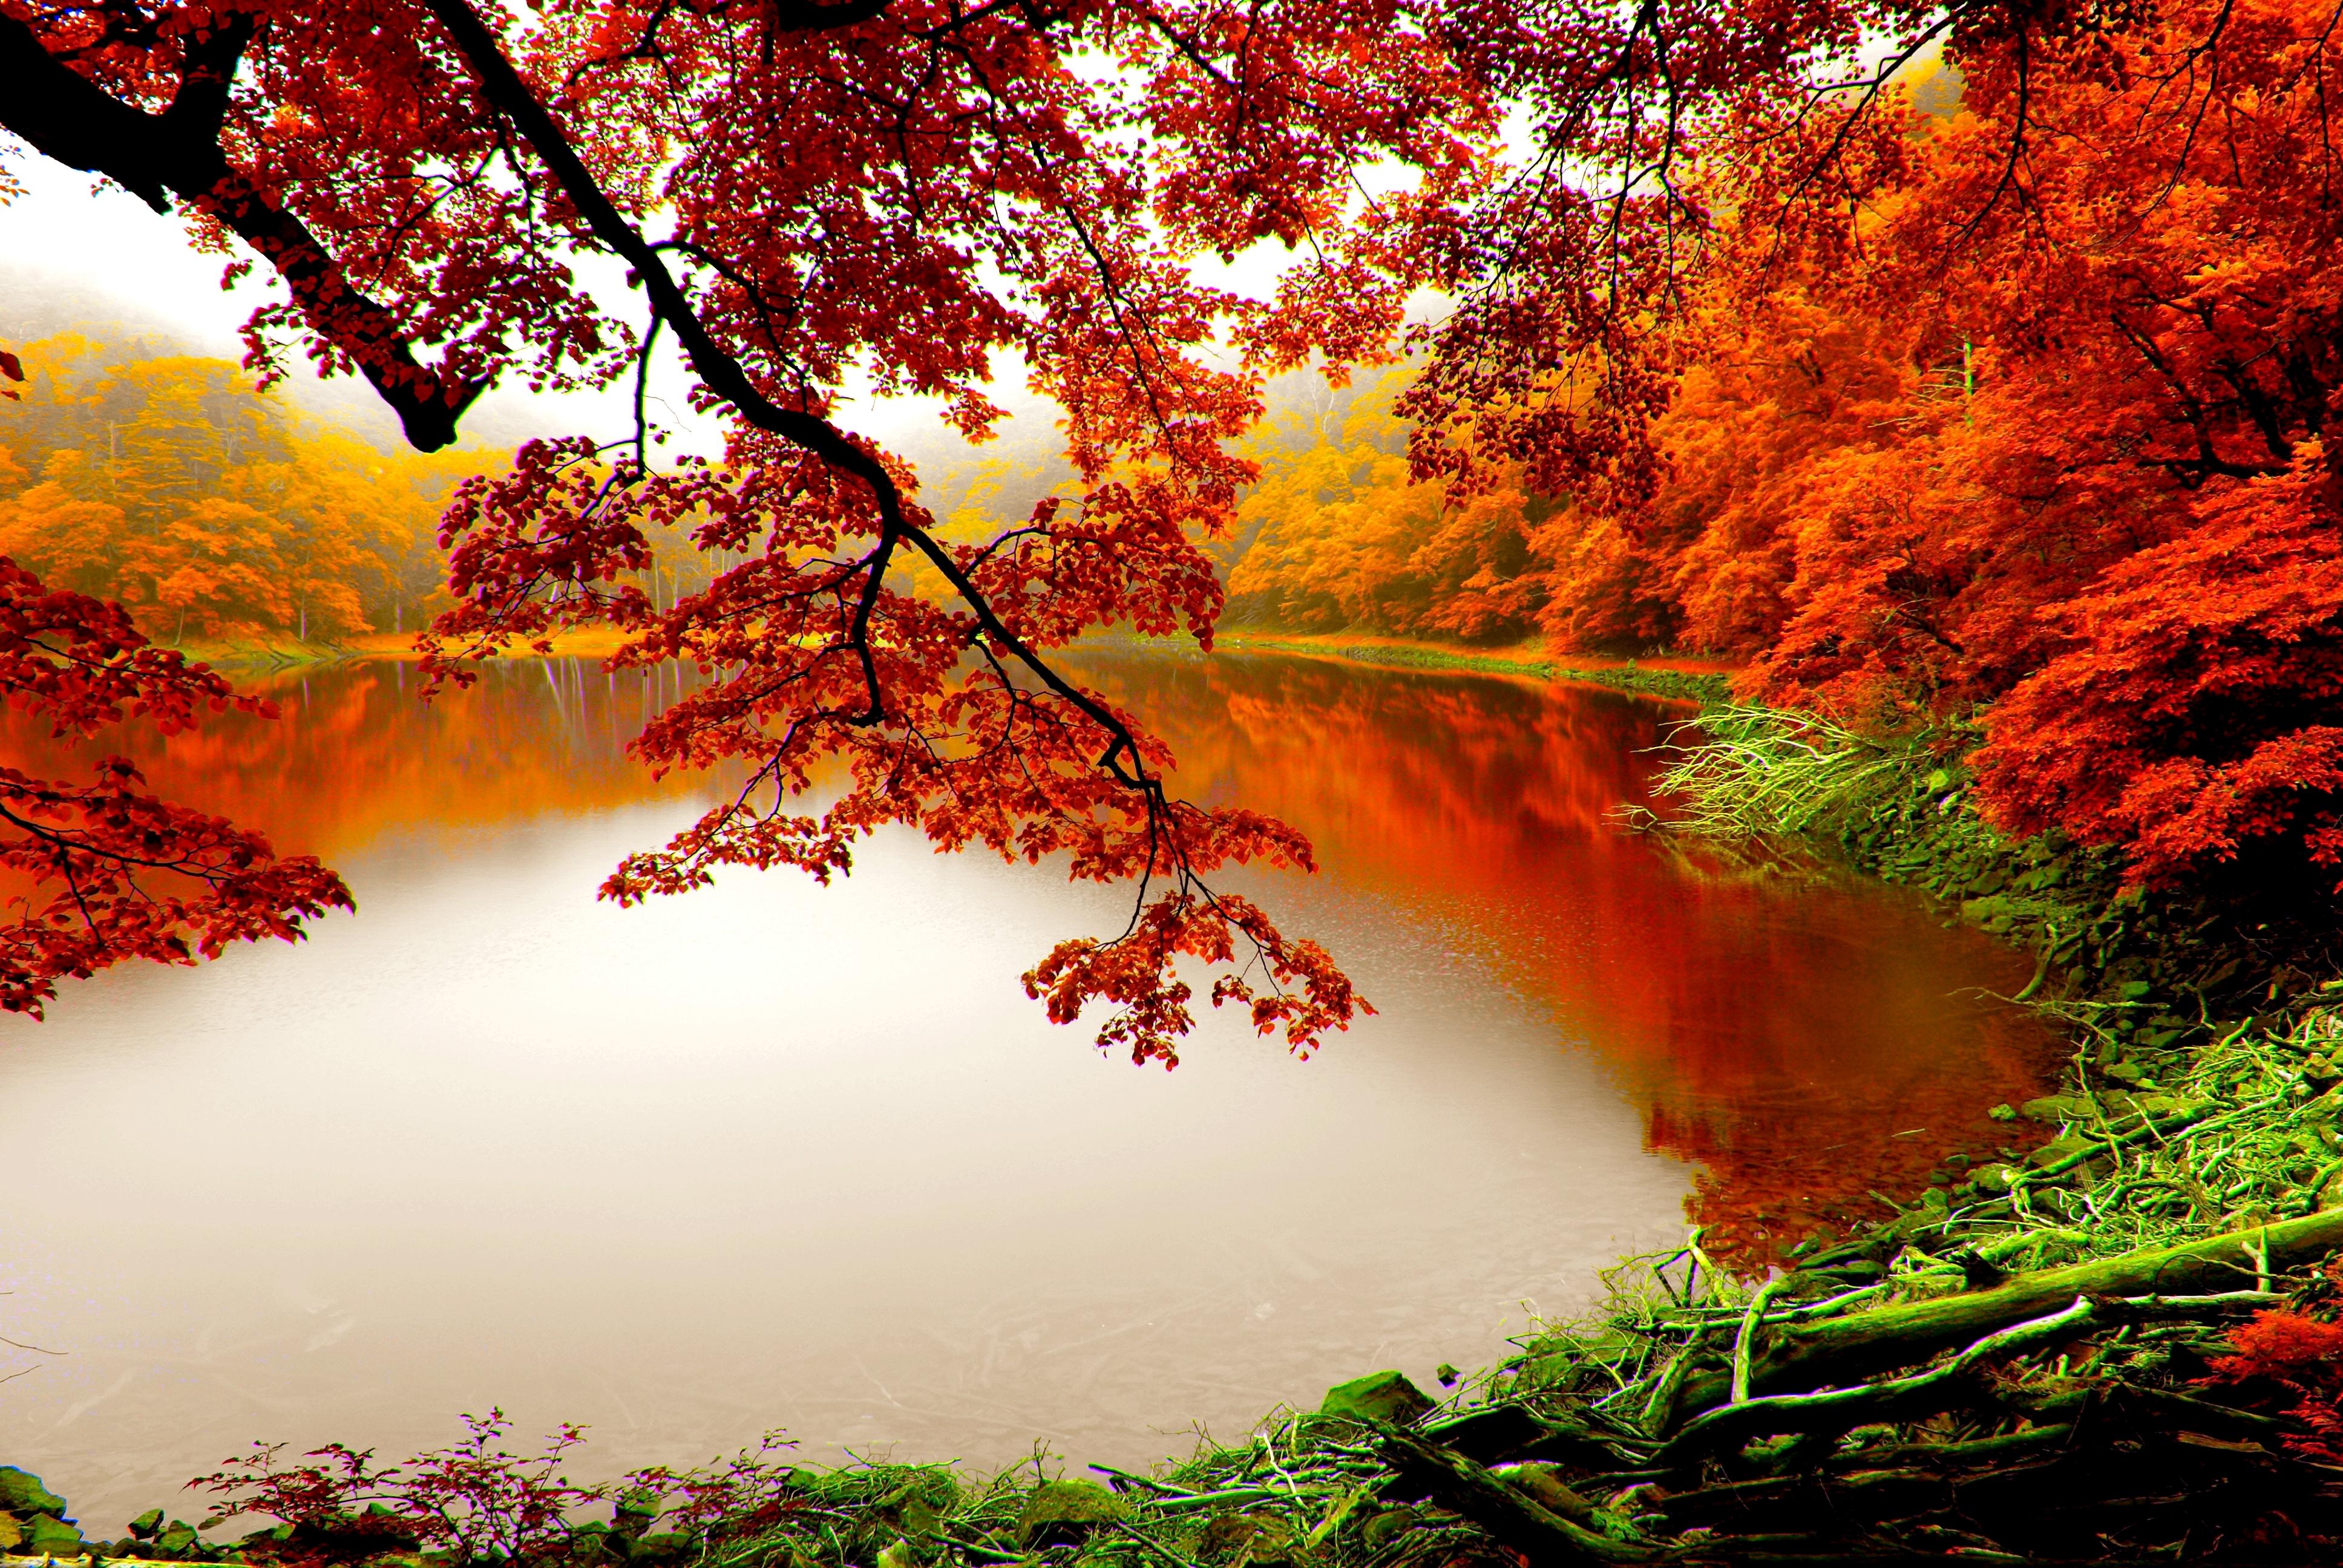 [45+] Autumn Lake Desktop Wallpaper on WallpaperSafari